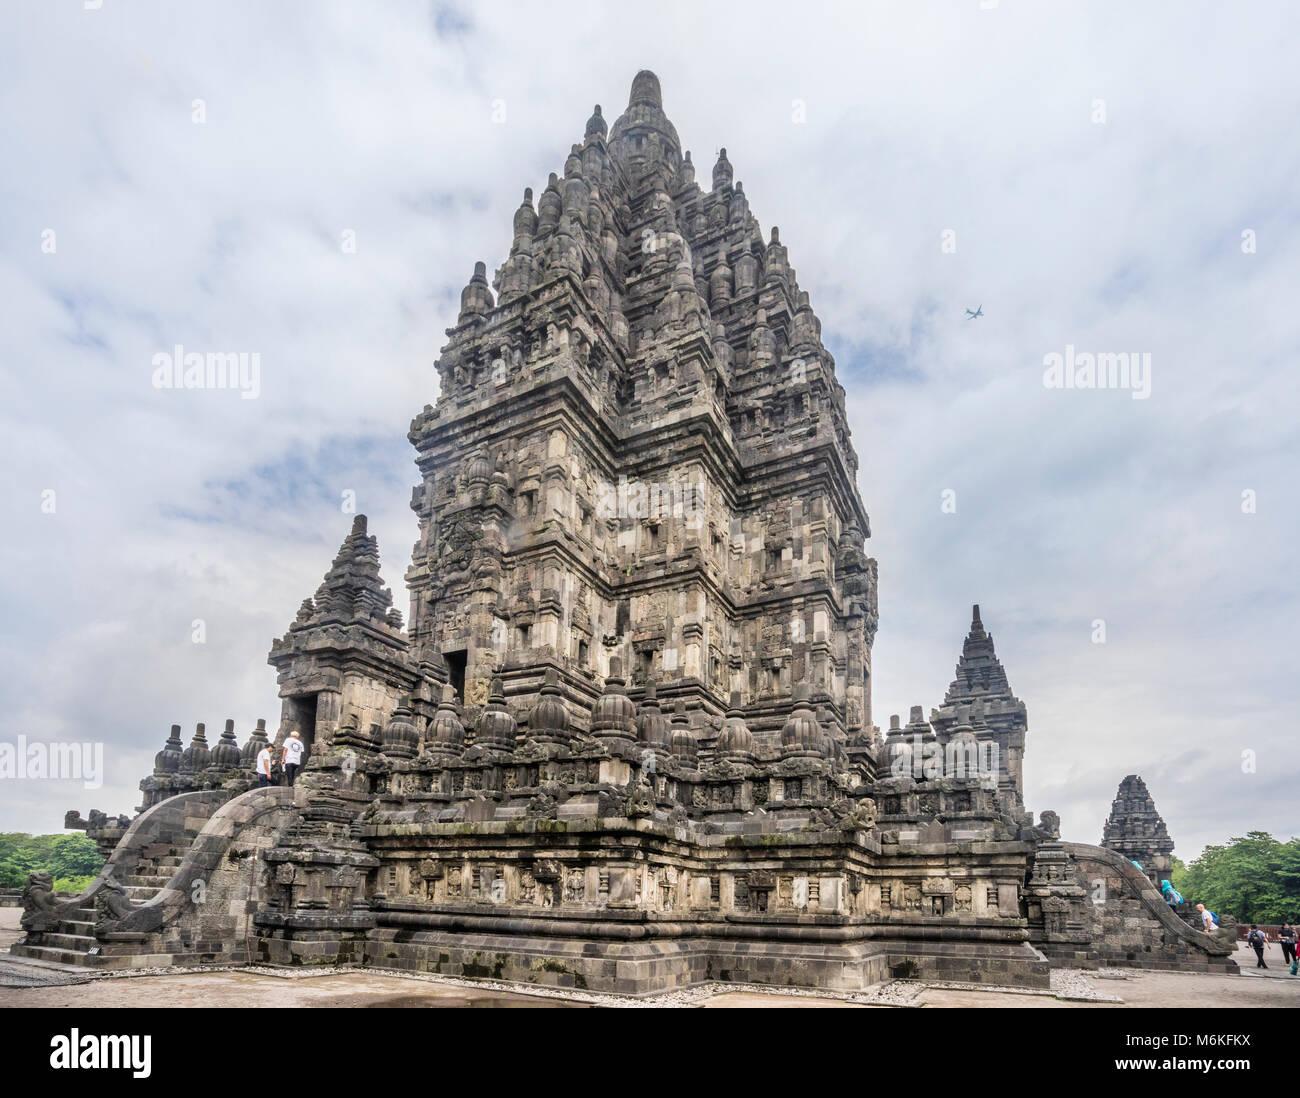 Indonesia, Central Java, view of the Trimurti shrine dedicated to Shiva (Candi Siwa) at the mid-9th century Prambanan - Stock Image